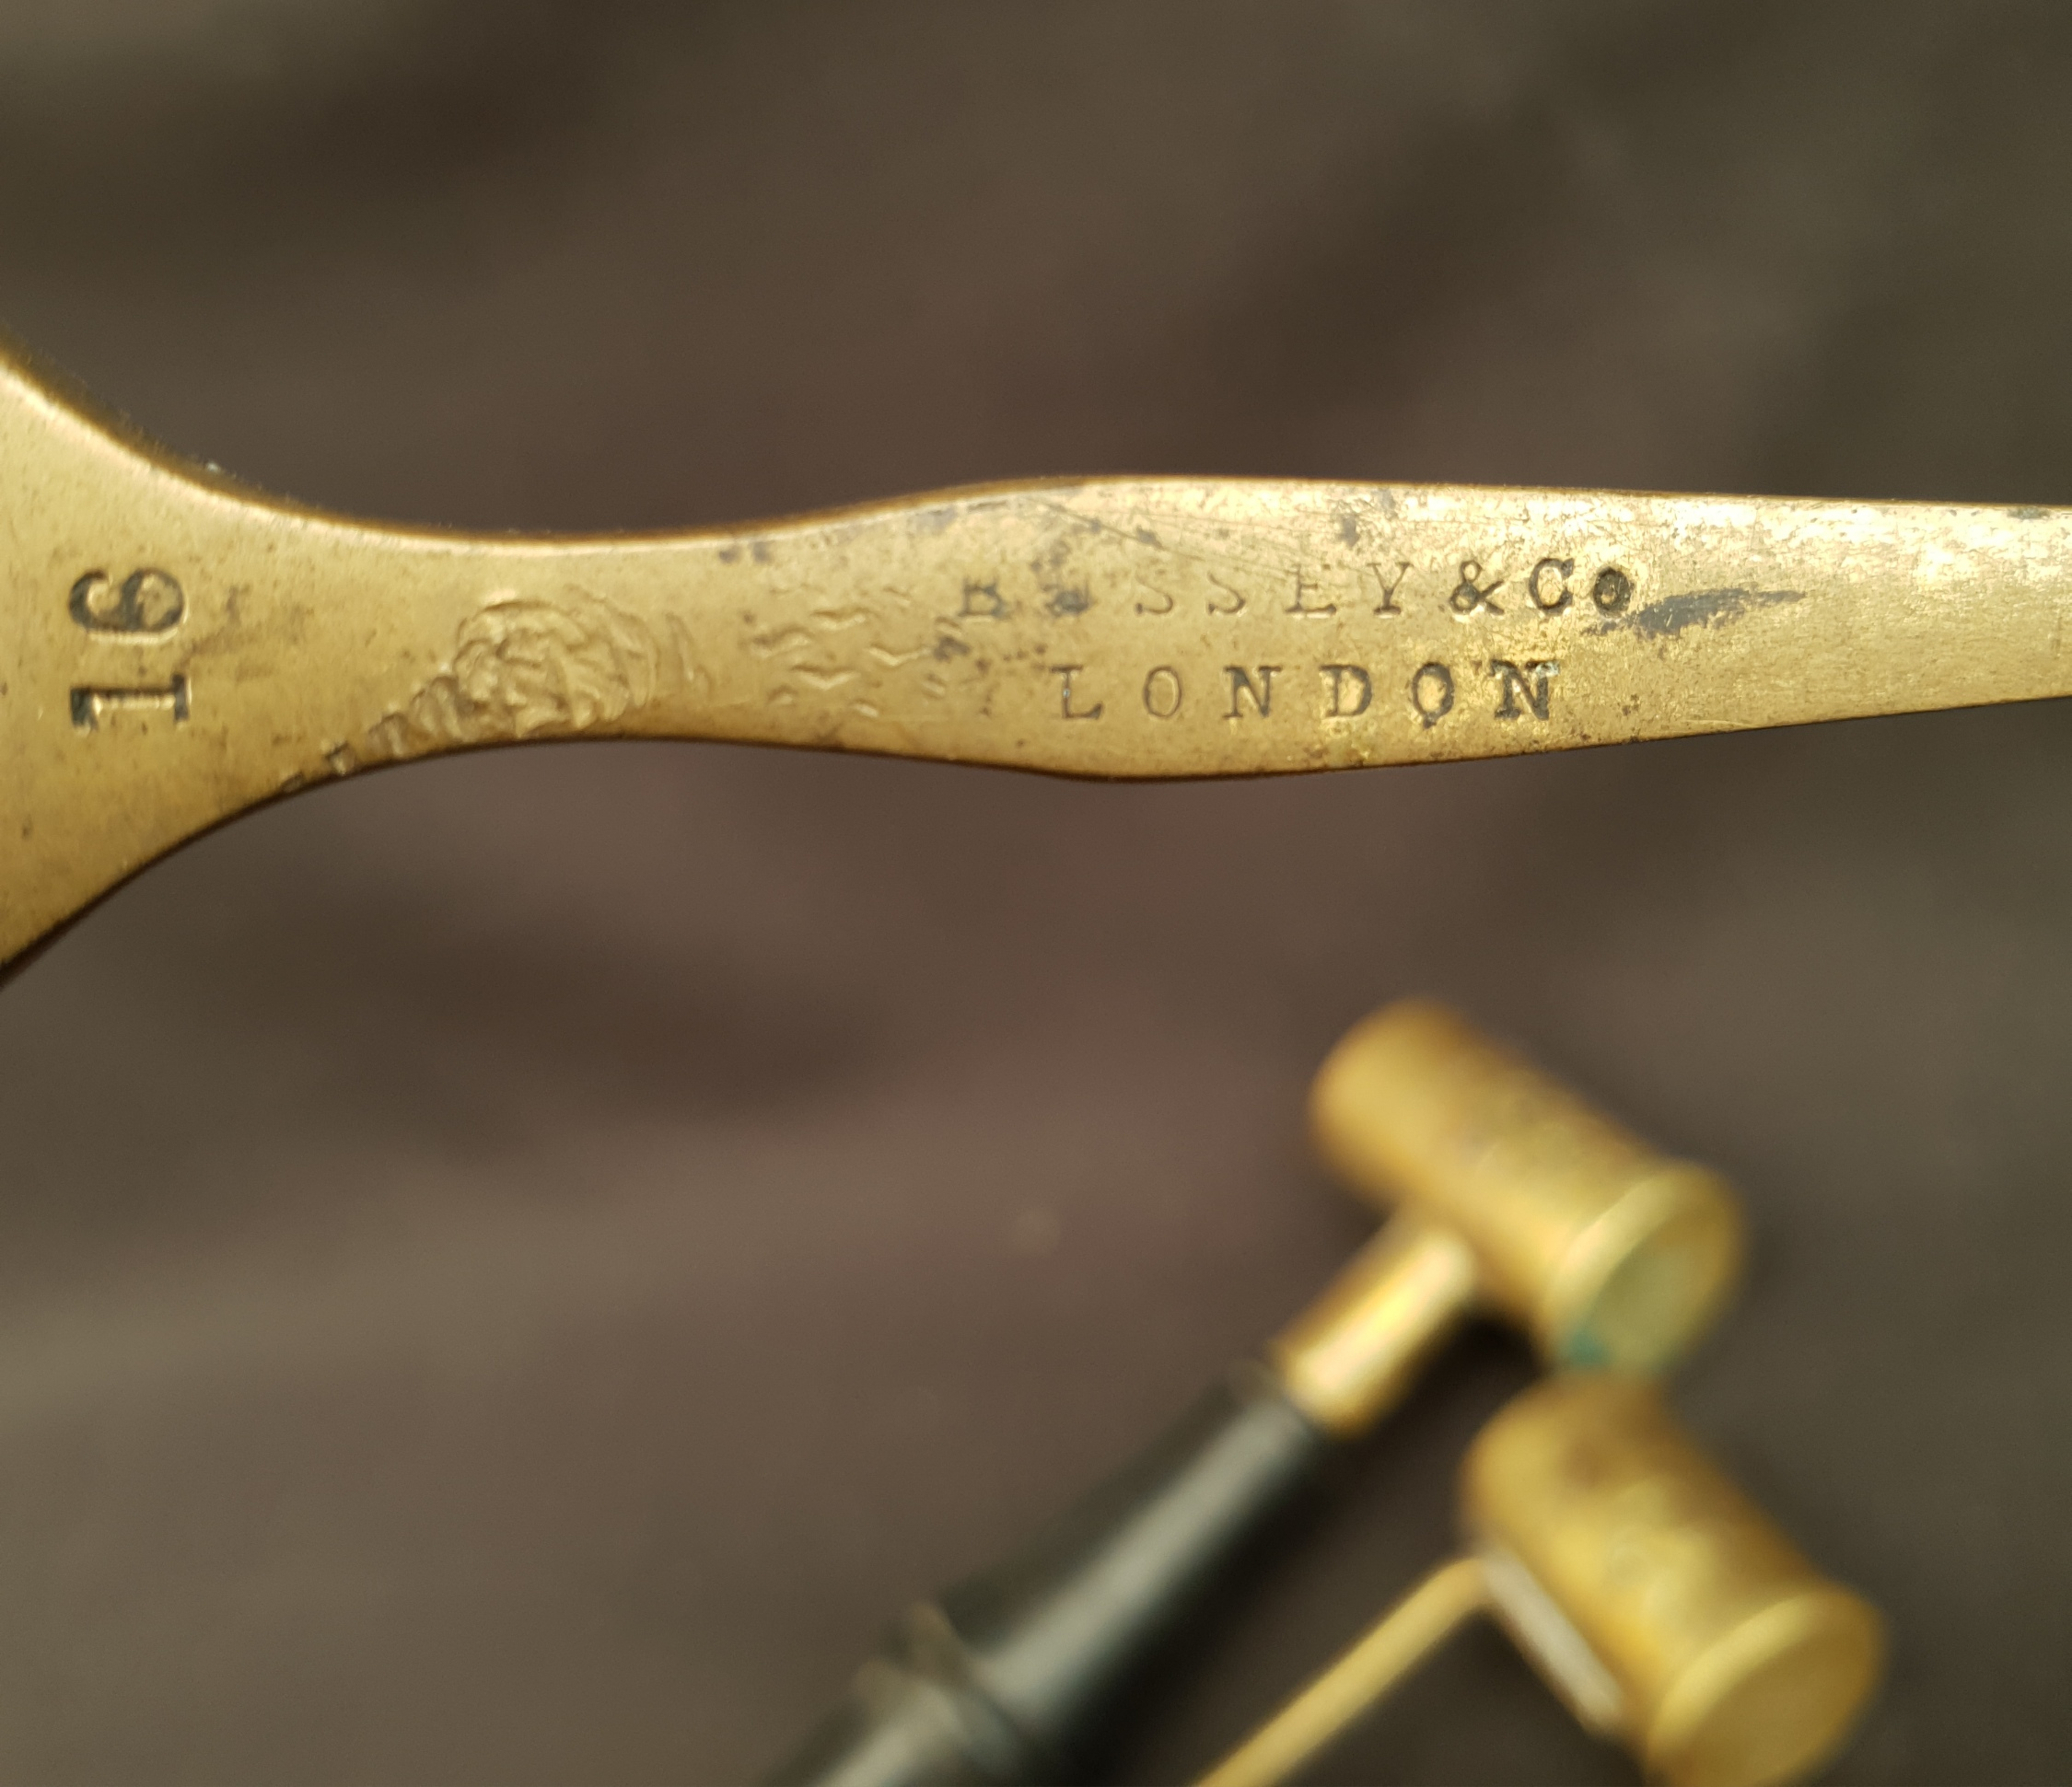 Antique Shooting 2 x Dixon & Co Black Powder Measures & Bussey Brass Measure - Image 4 of 4